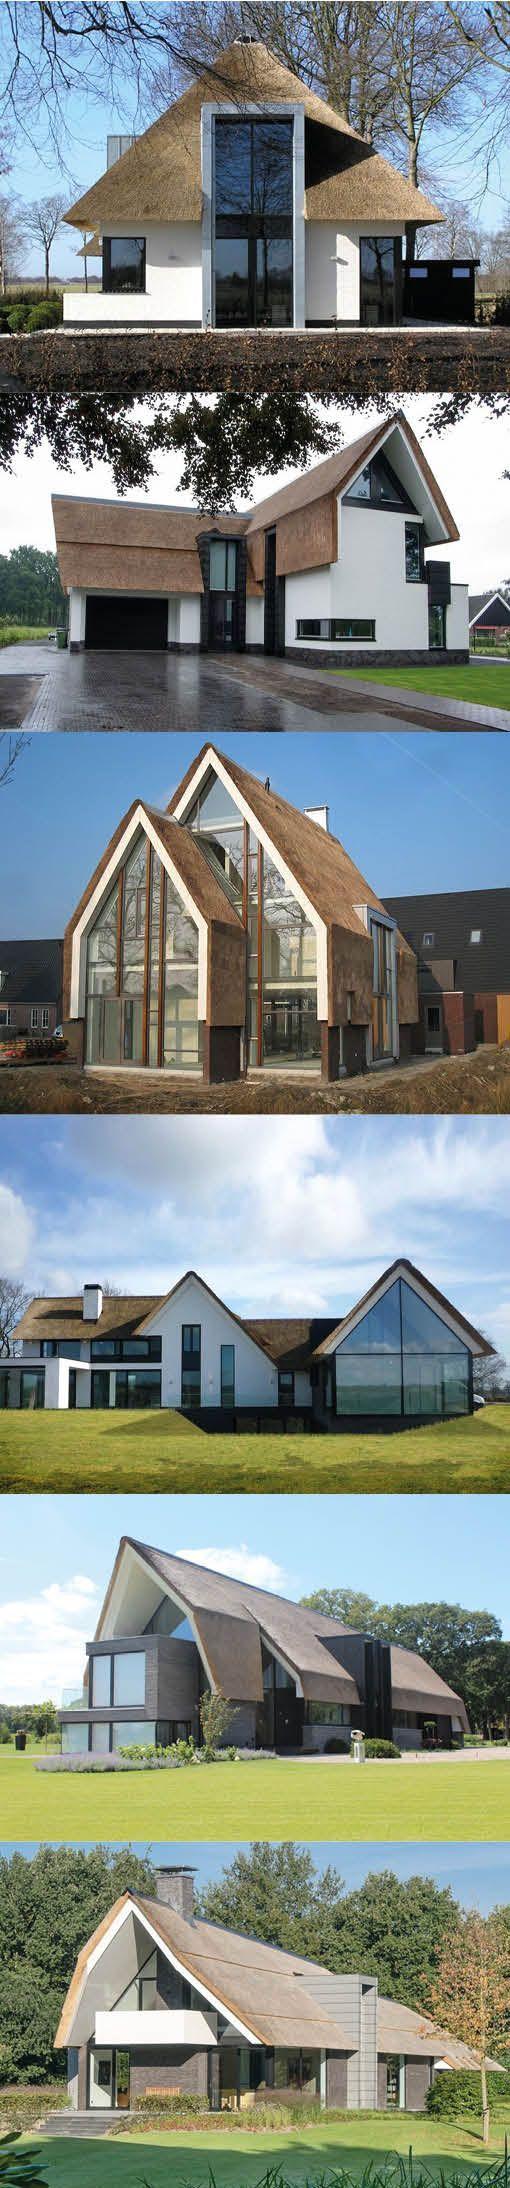 Contemporary Dutch thatched farmhouses / Maas Architecten / Bekhuis & Kleinjan (a.o.) / NL / thatch